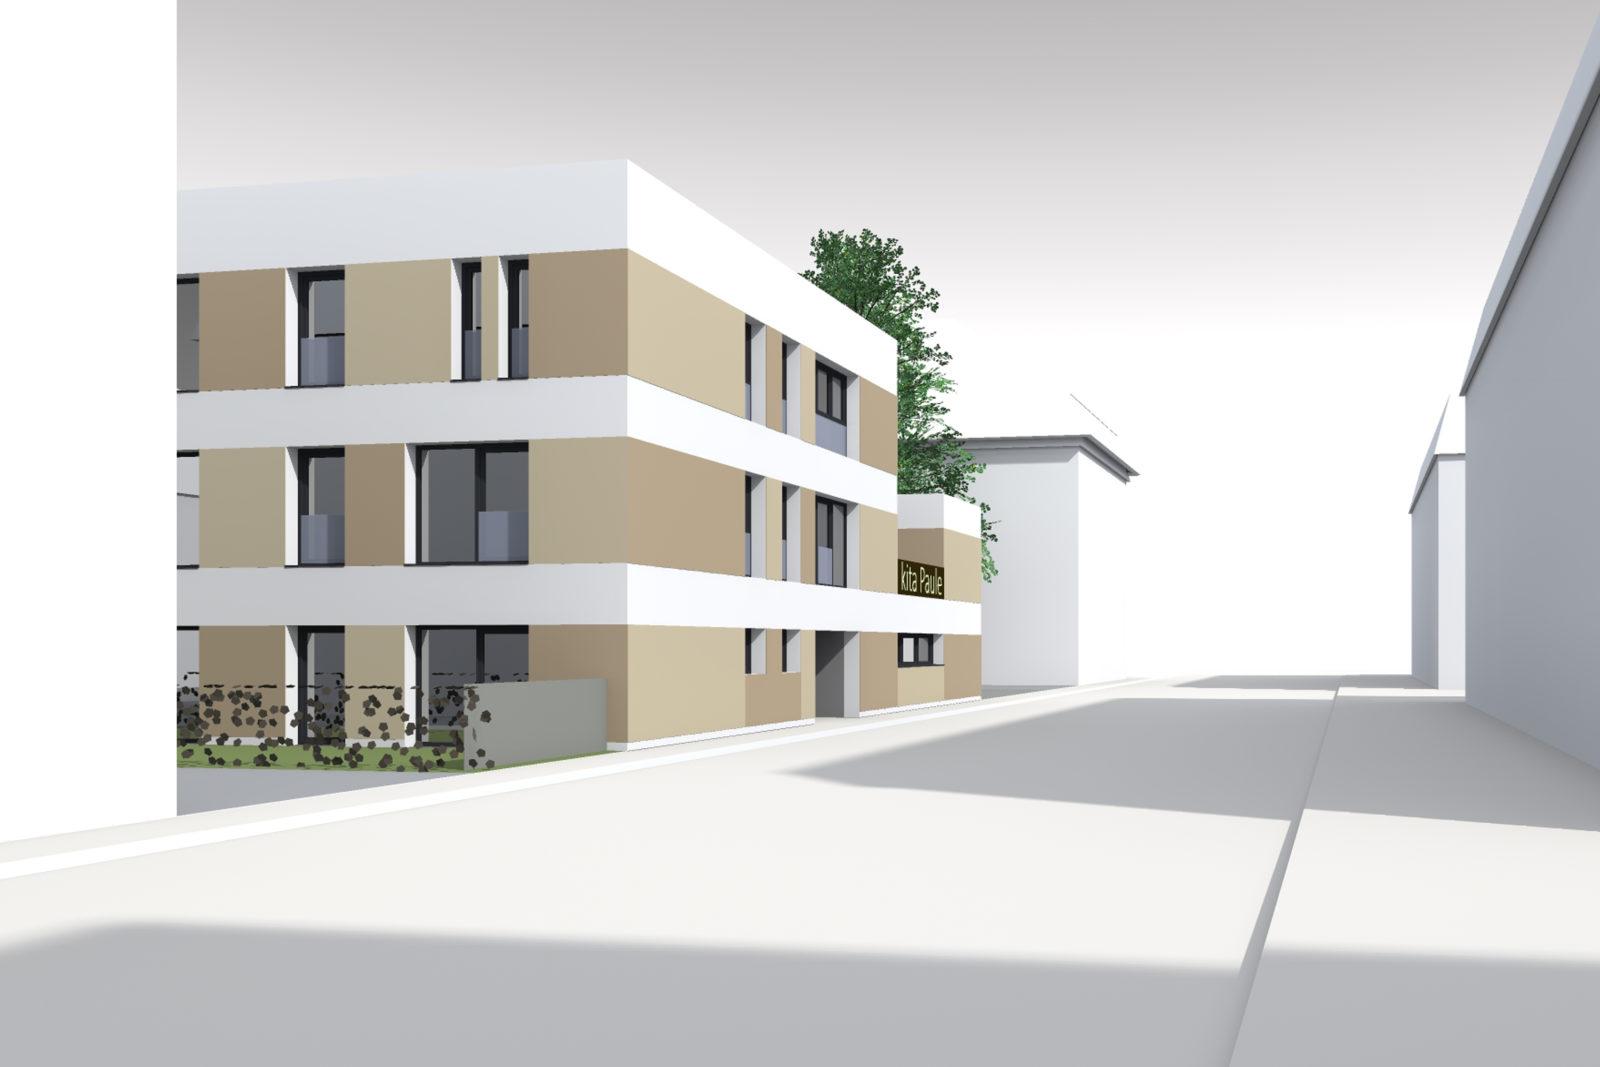 Neubau Kita Paul-Küstner-Straße in Leipzig, Alt-Lindenau - Blick von der Straße